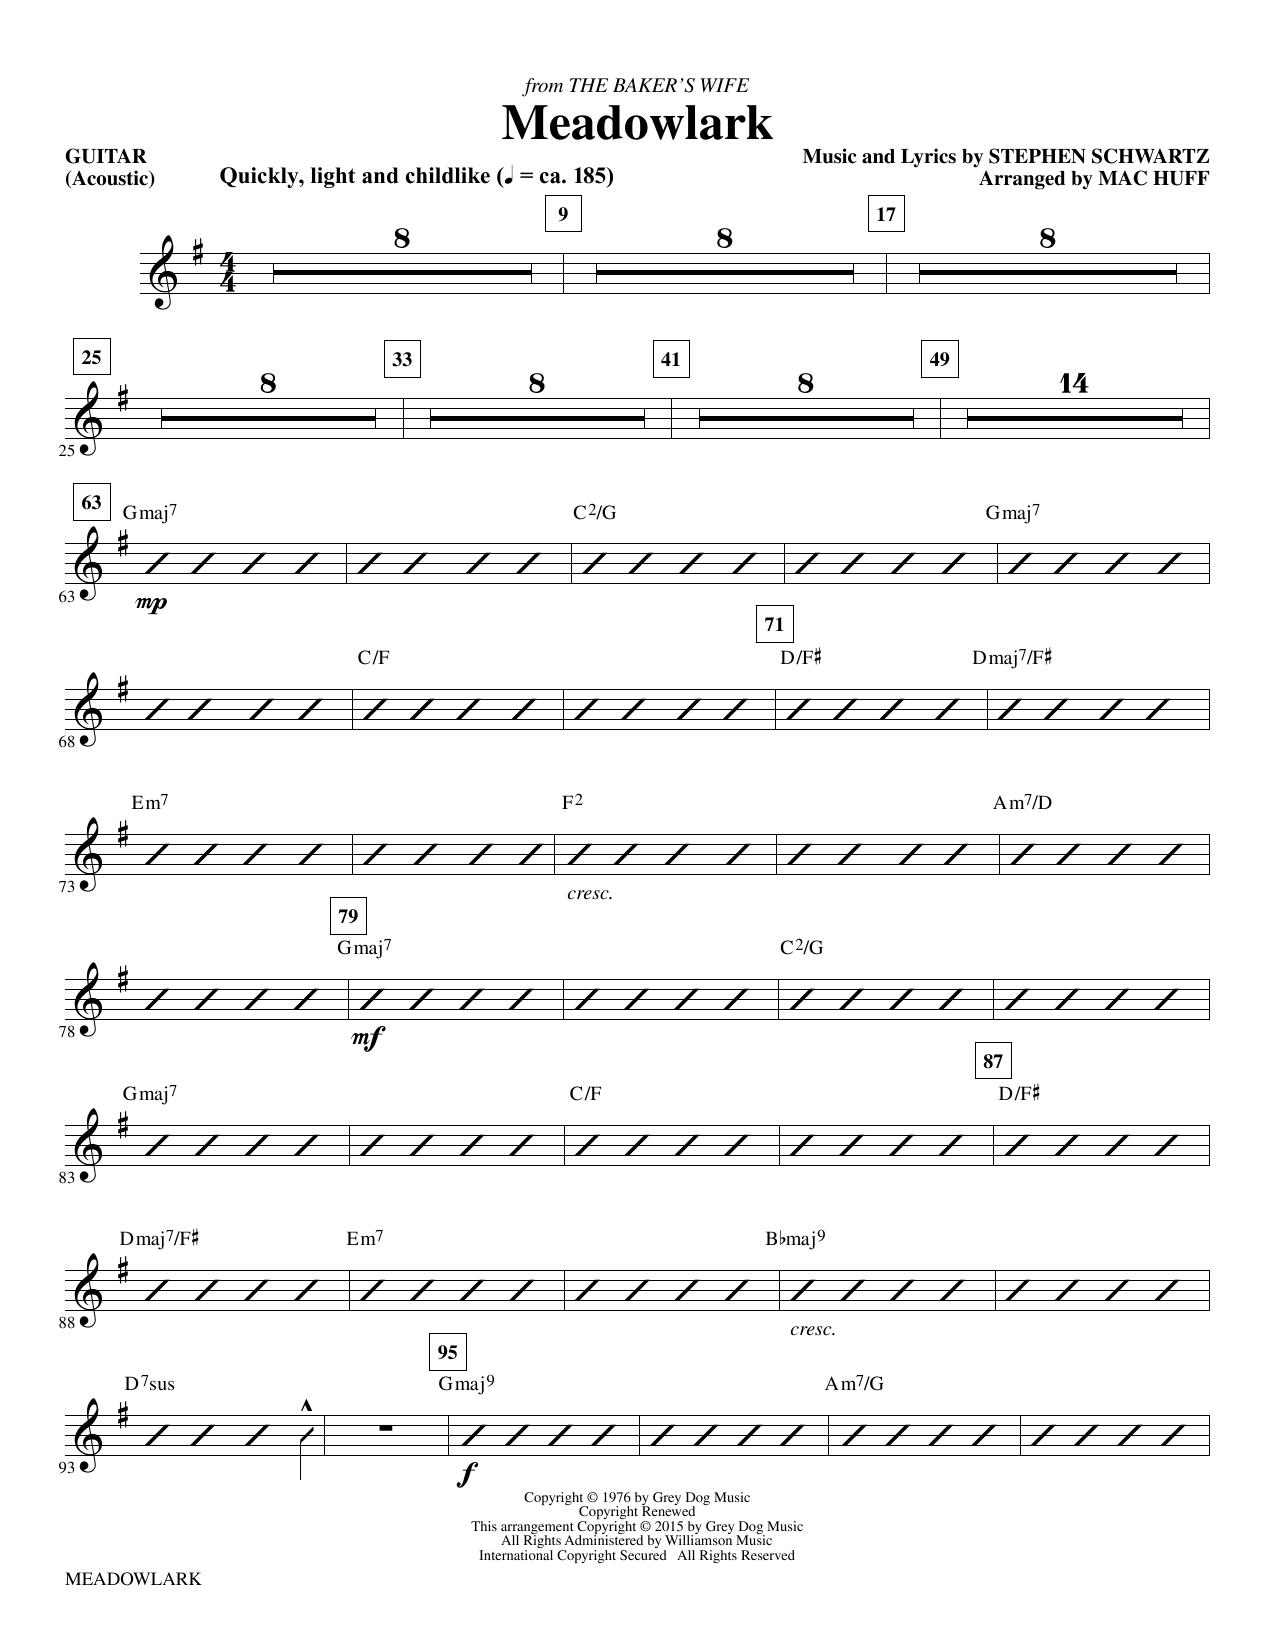 Meadowlark - Guitar sheet music